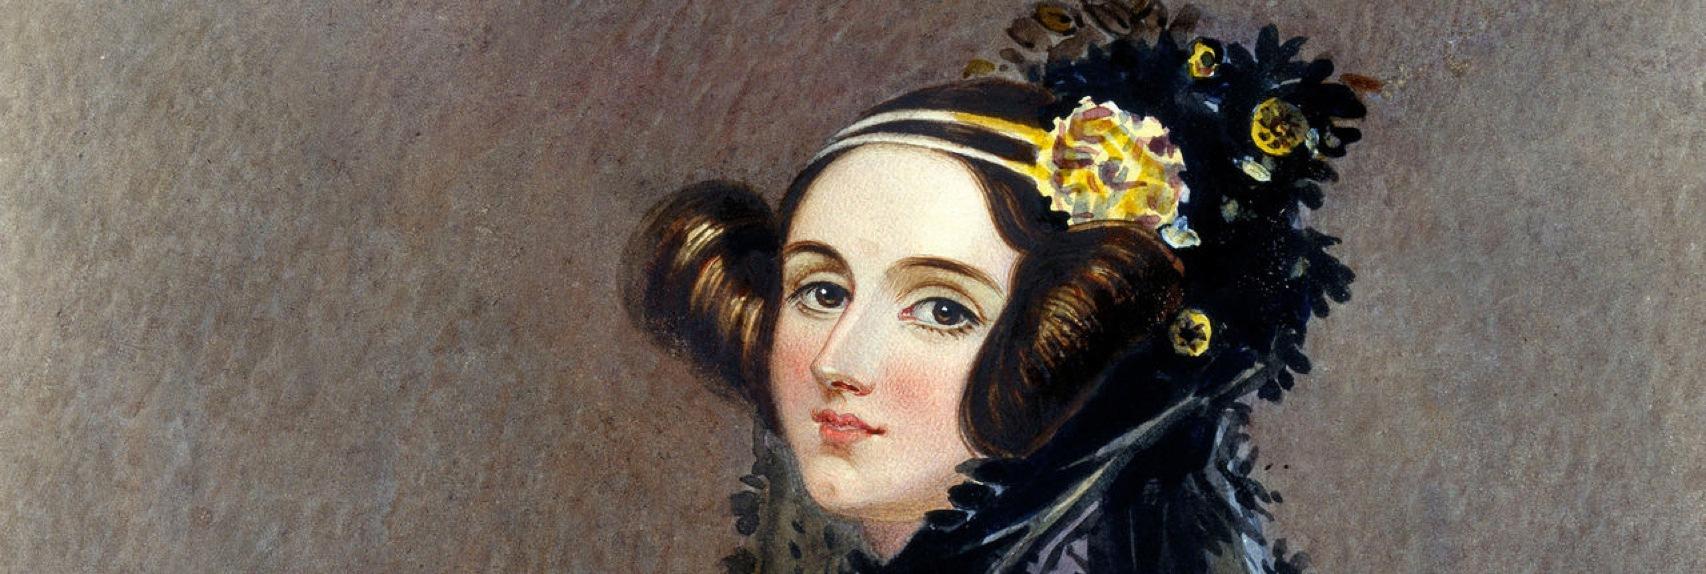 Ada Lovelace Portrait 1 19A09873365001Ae